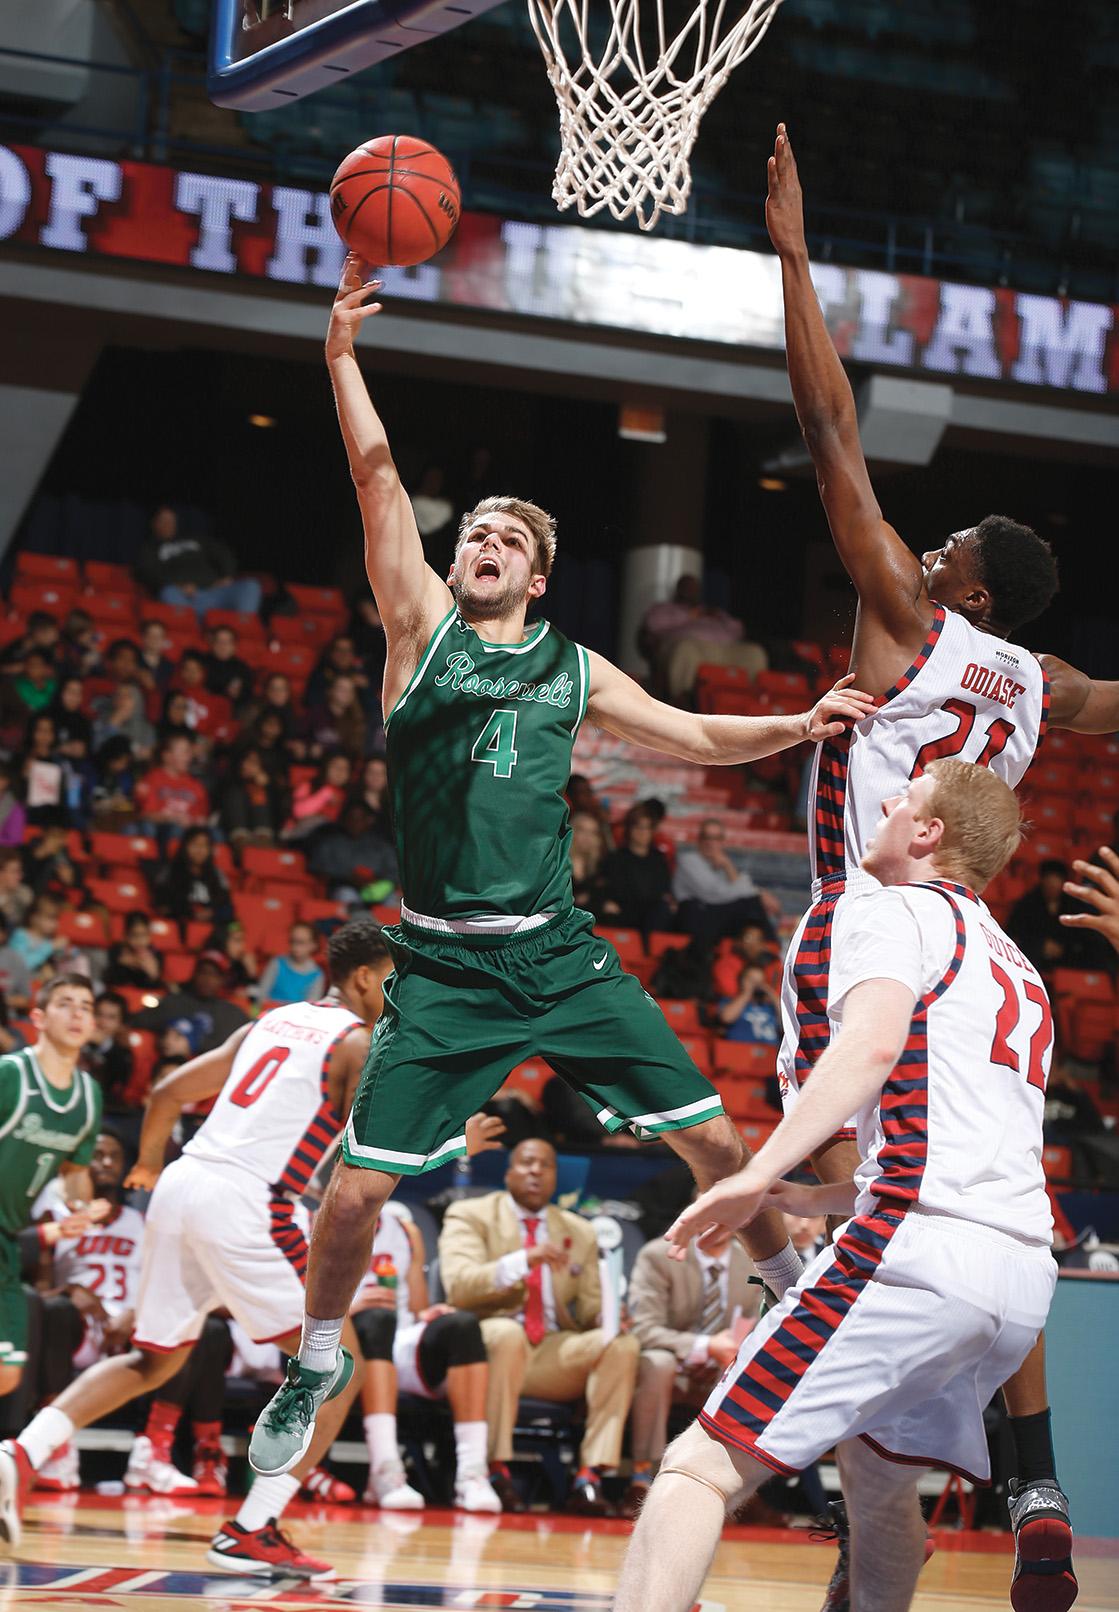 Jake Ludwig playing basketball